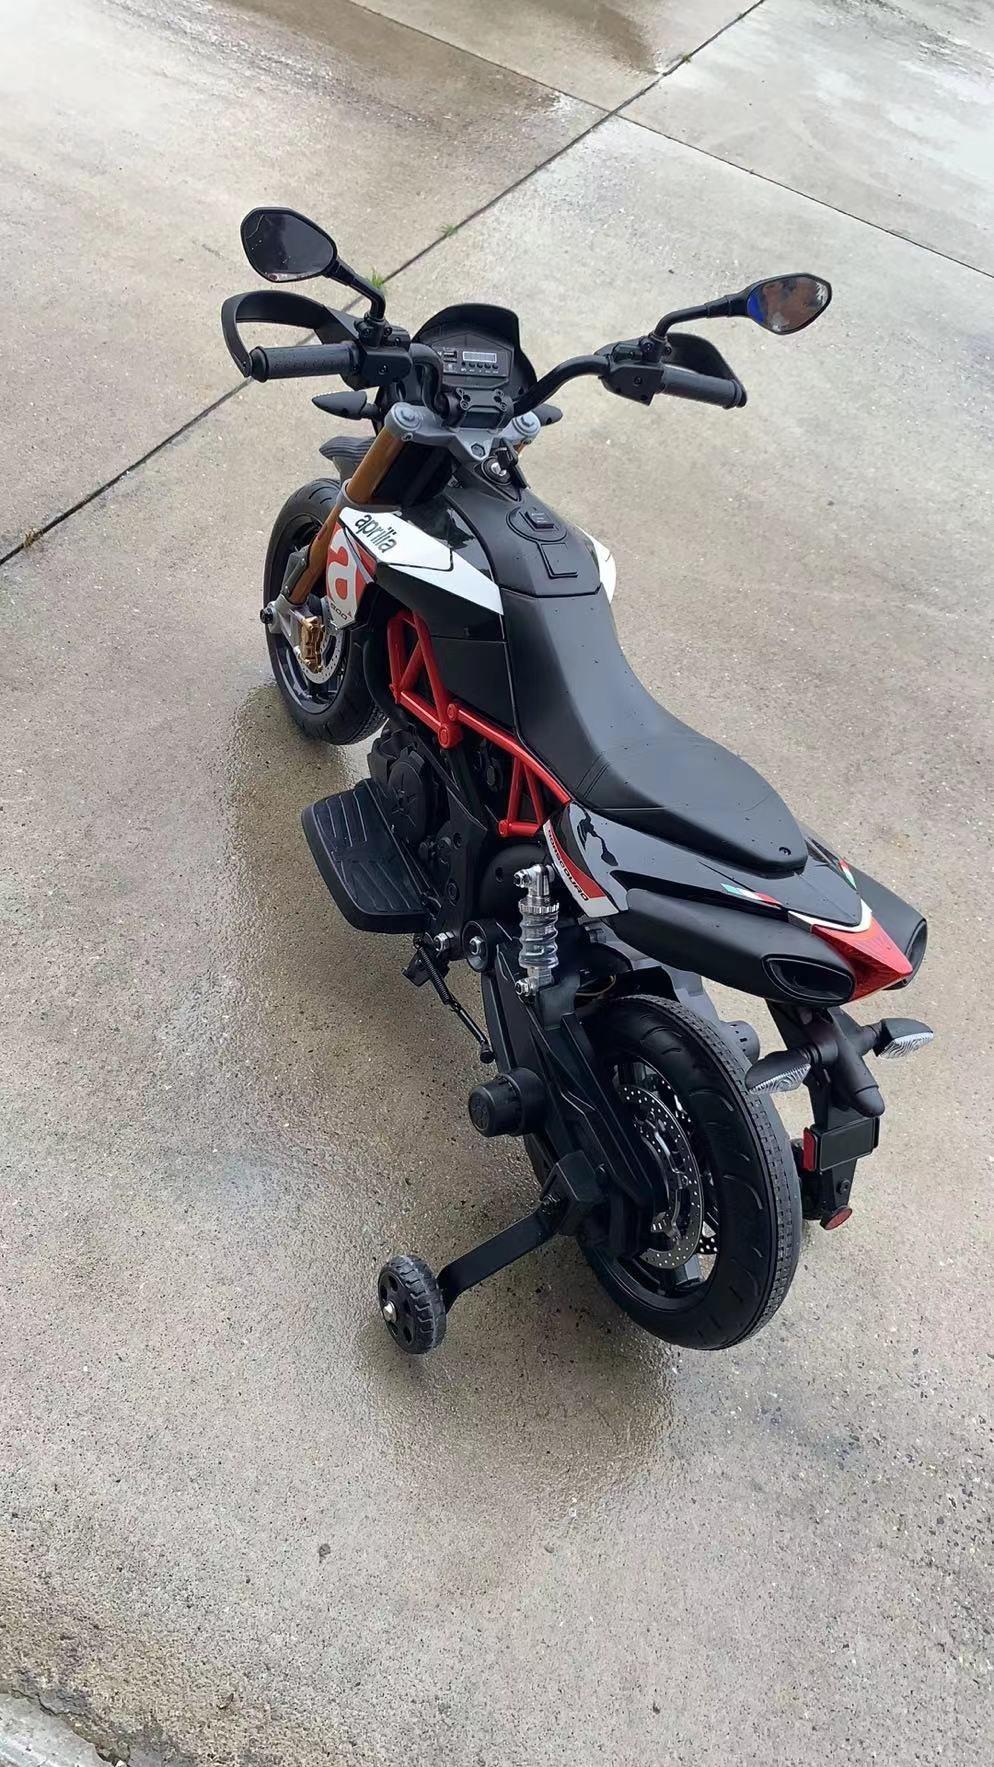 12V kids motorcycle bike W/ Training Wheels photo review